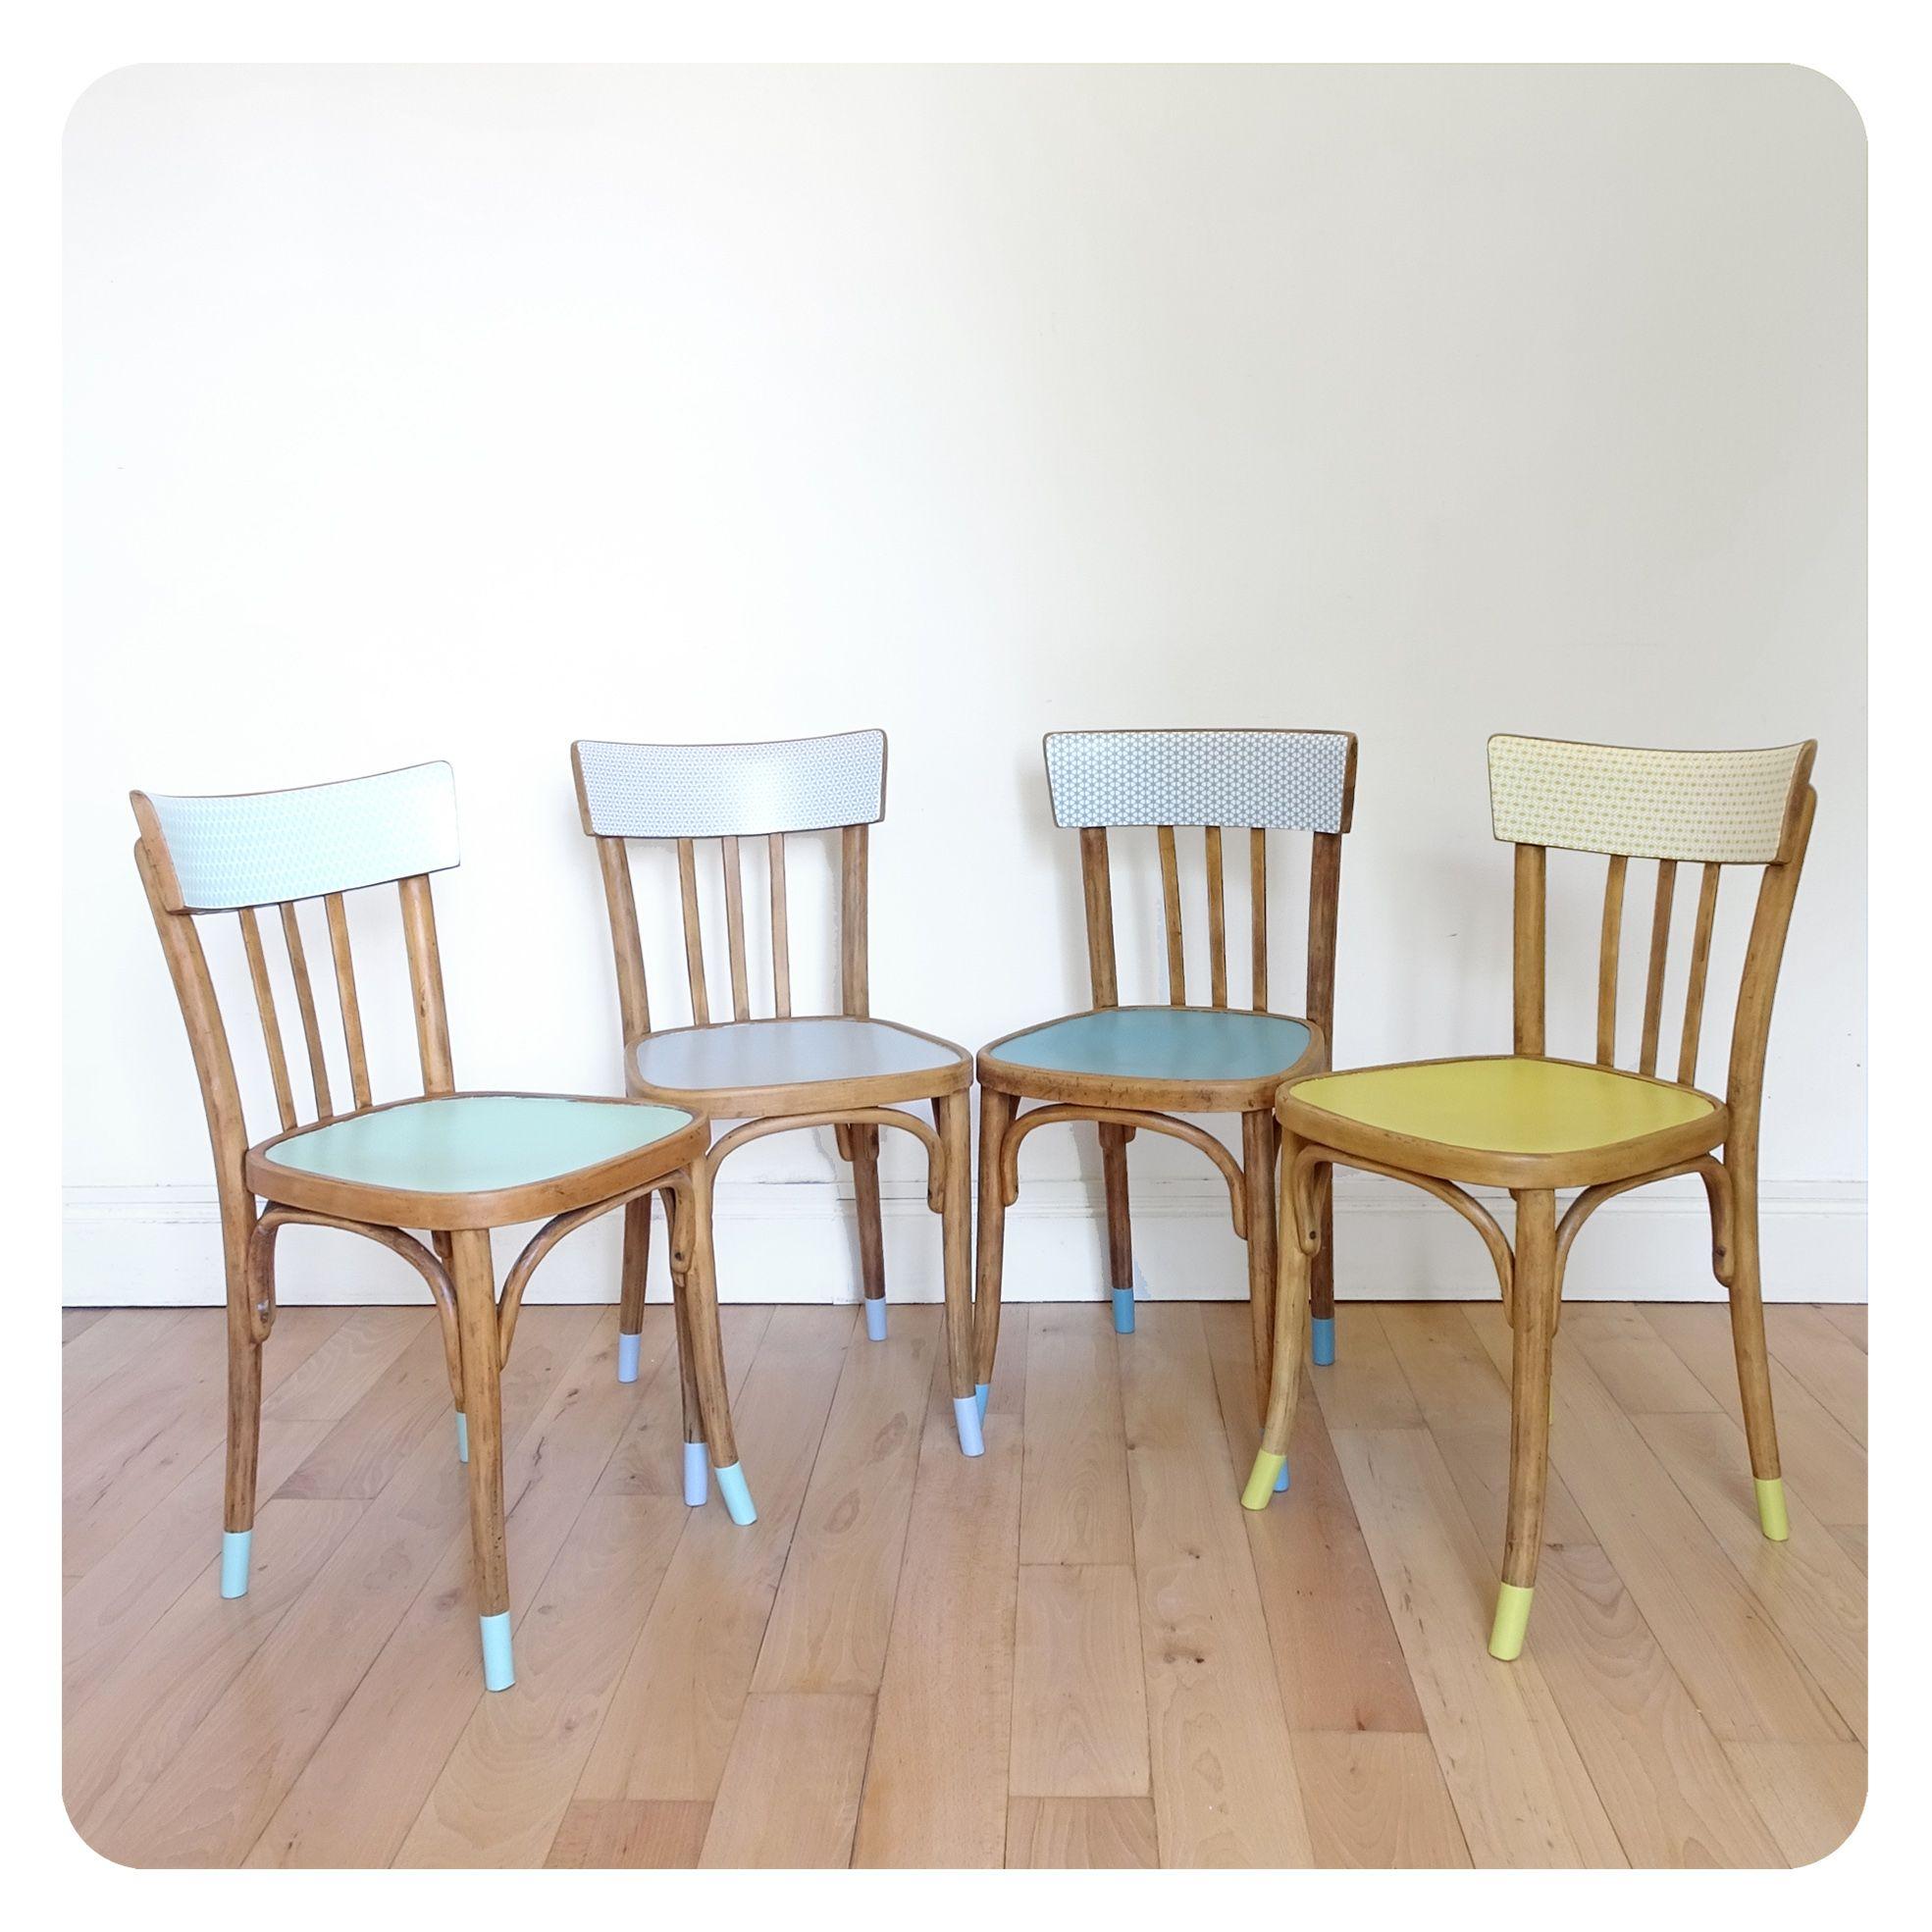 4 Chaises Vintage Chaise Vintage Chaise 4 Chaises